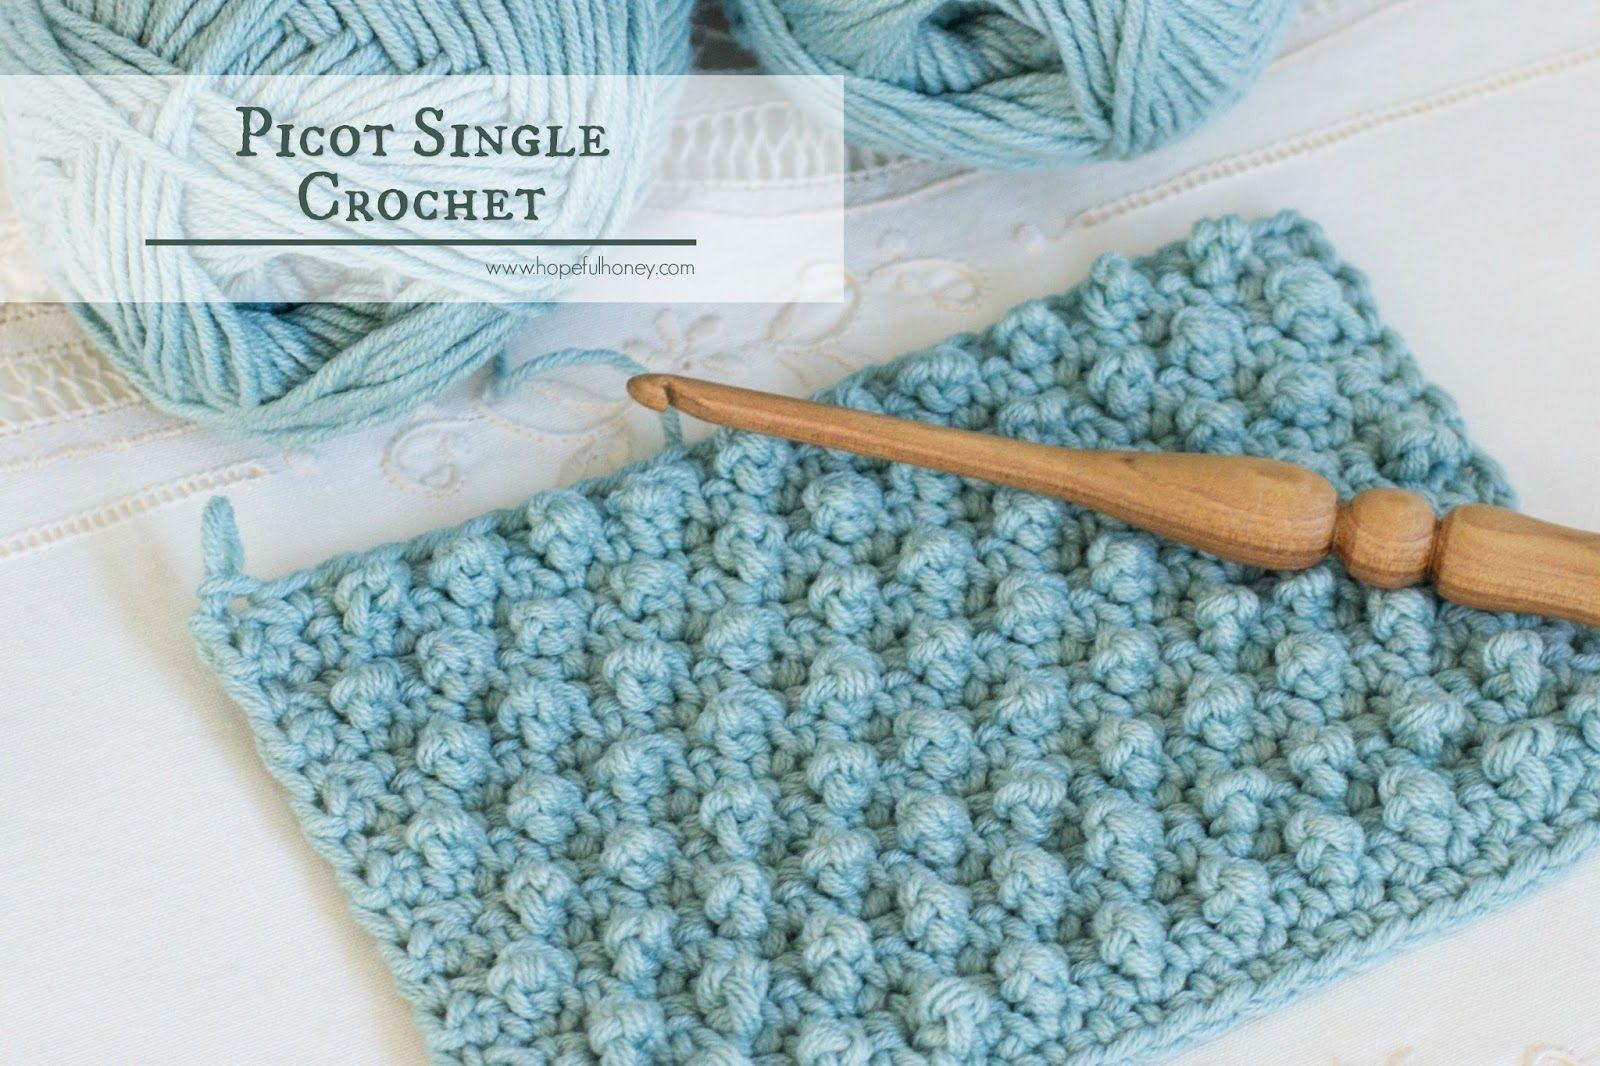 How To: Crochet The Picot Single Crochet - Easy Tutorial ...